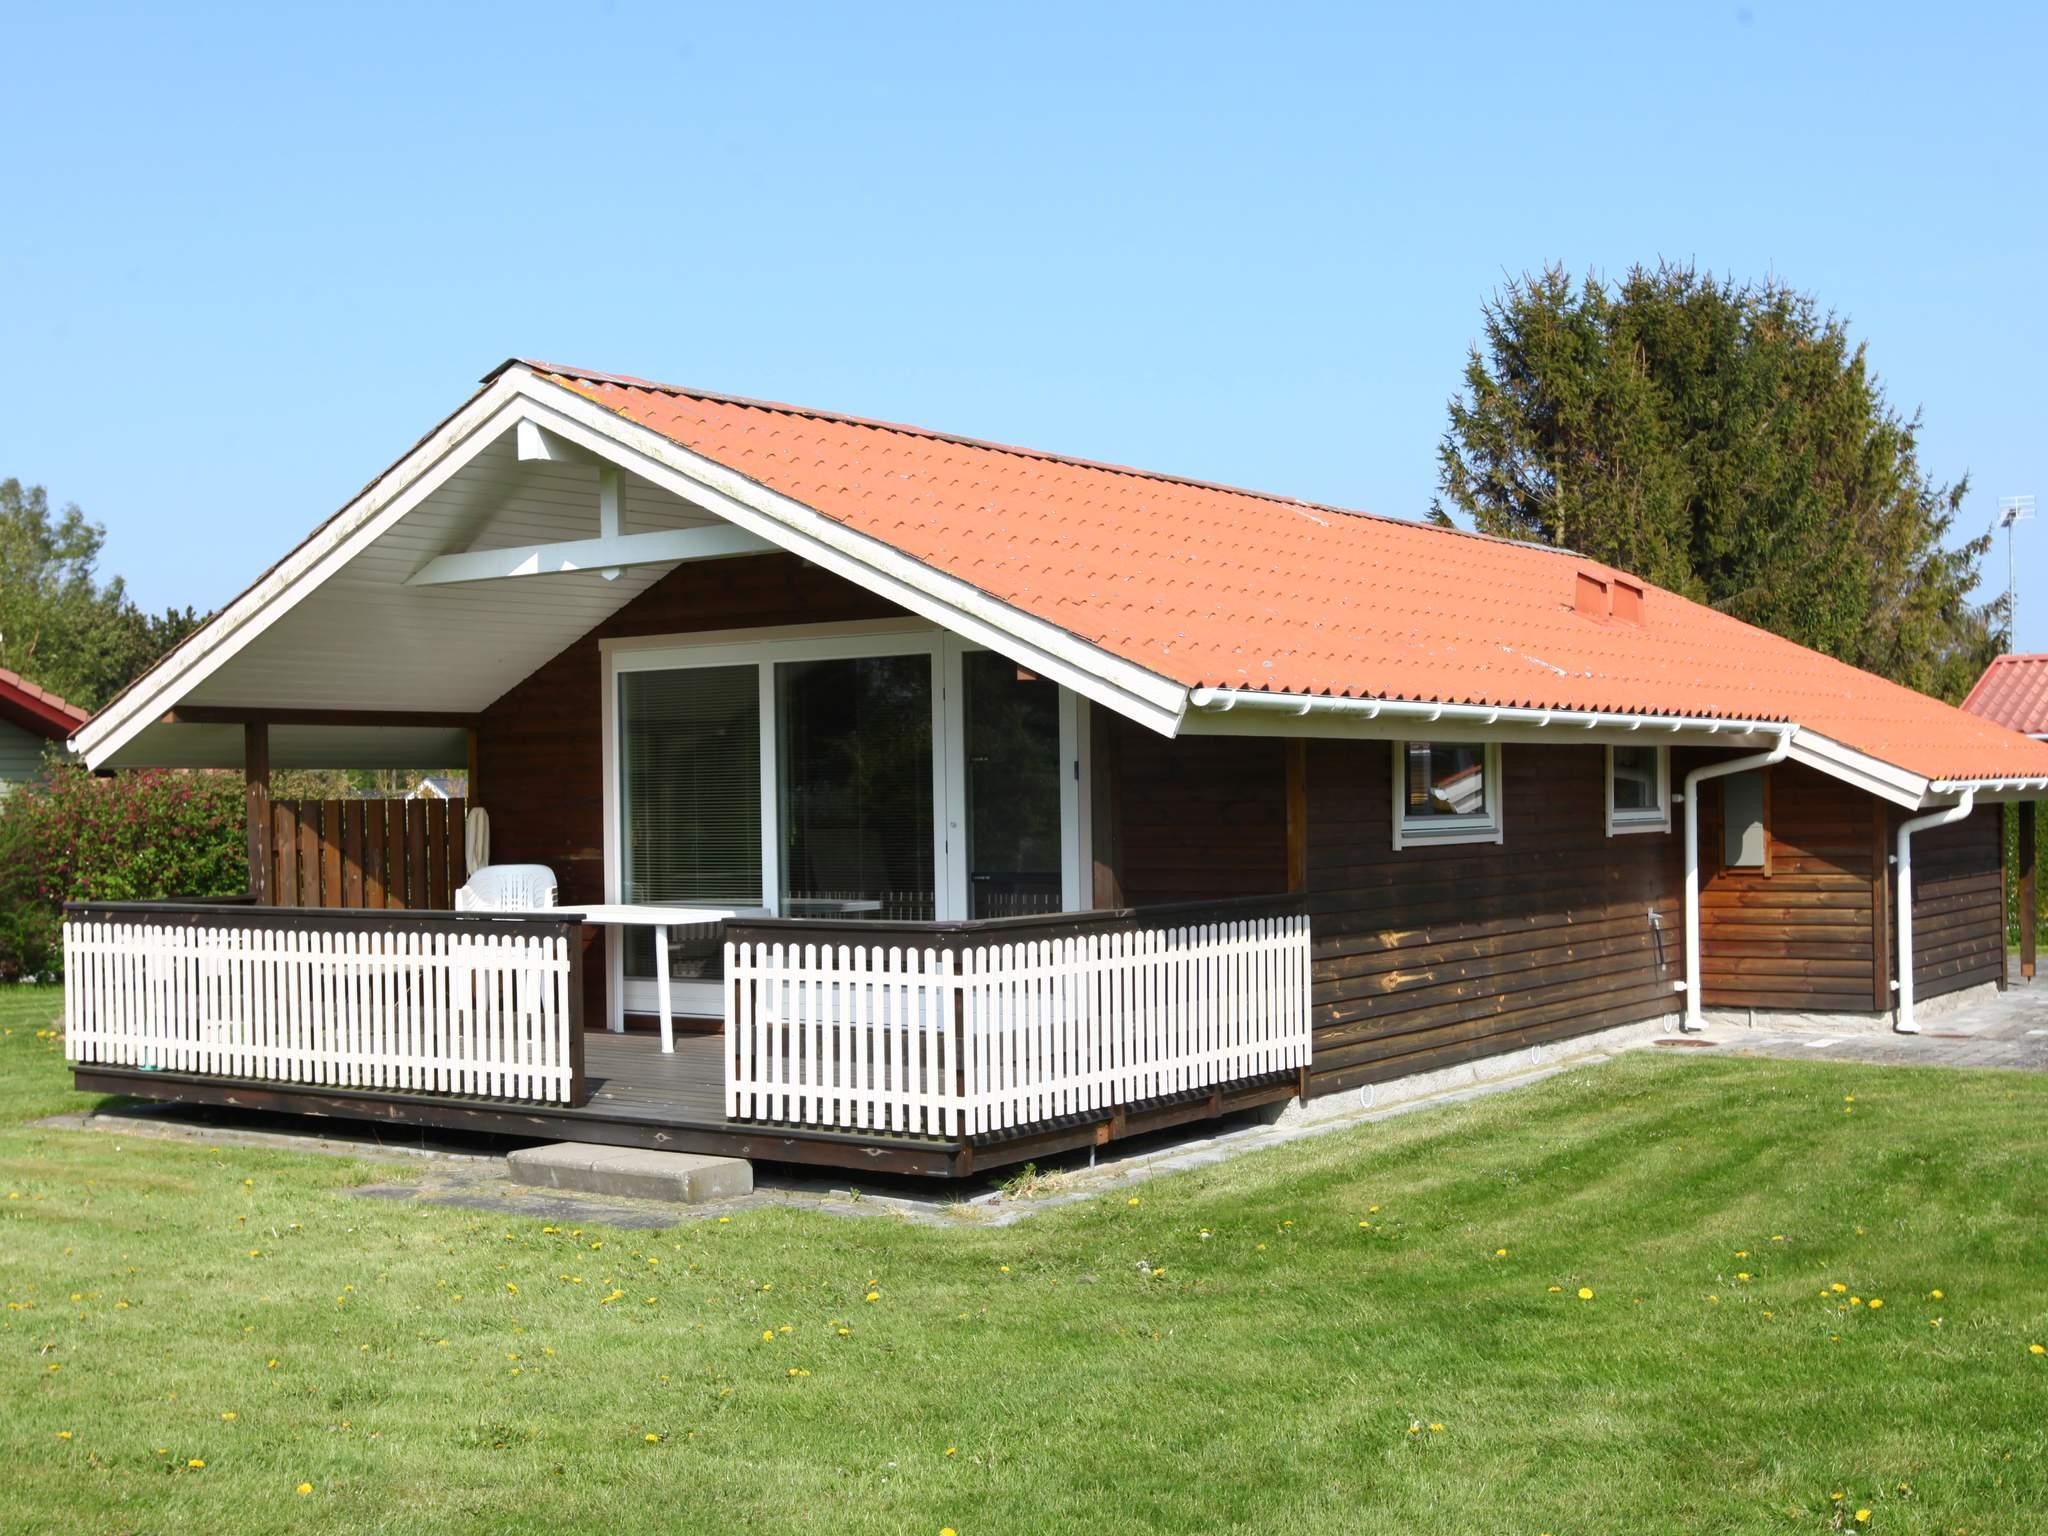 Ferienhaus Hyllingeriis (619896), Skibby, , Nordseeland, Dänemark, Bild 1